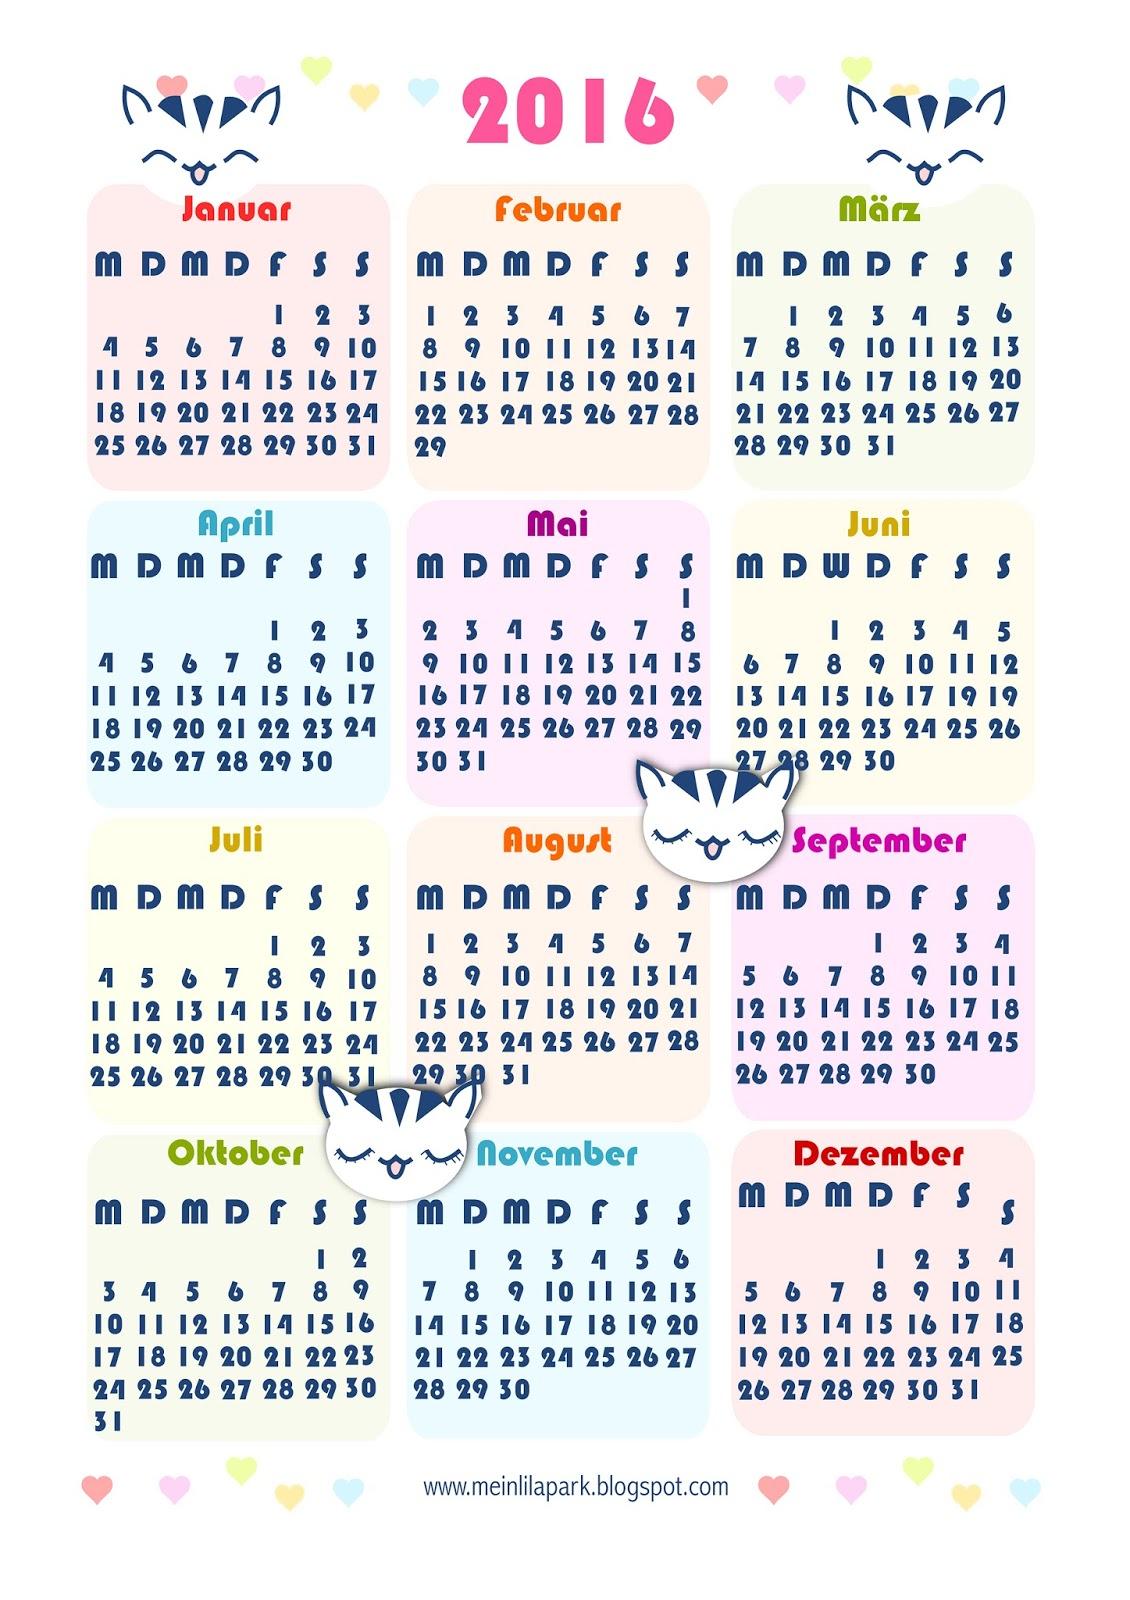 free printable 2016 kawaii calendar ausdruckbarer kalender 2016 freebie meinlilapark. Black Bedroom Furniture Sets. Home Design Ideas